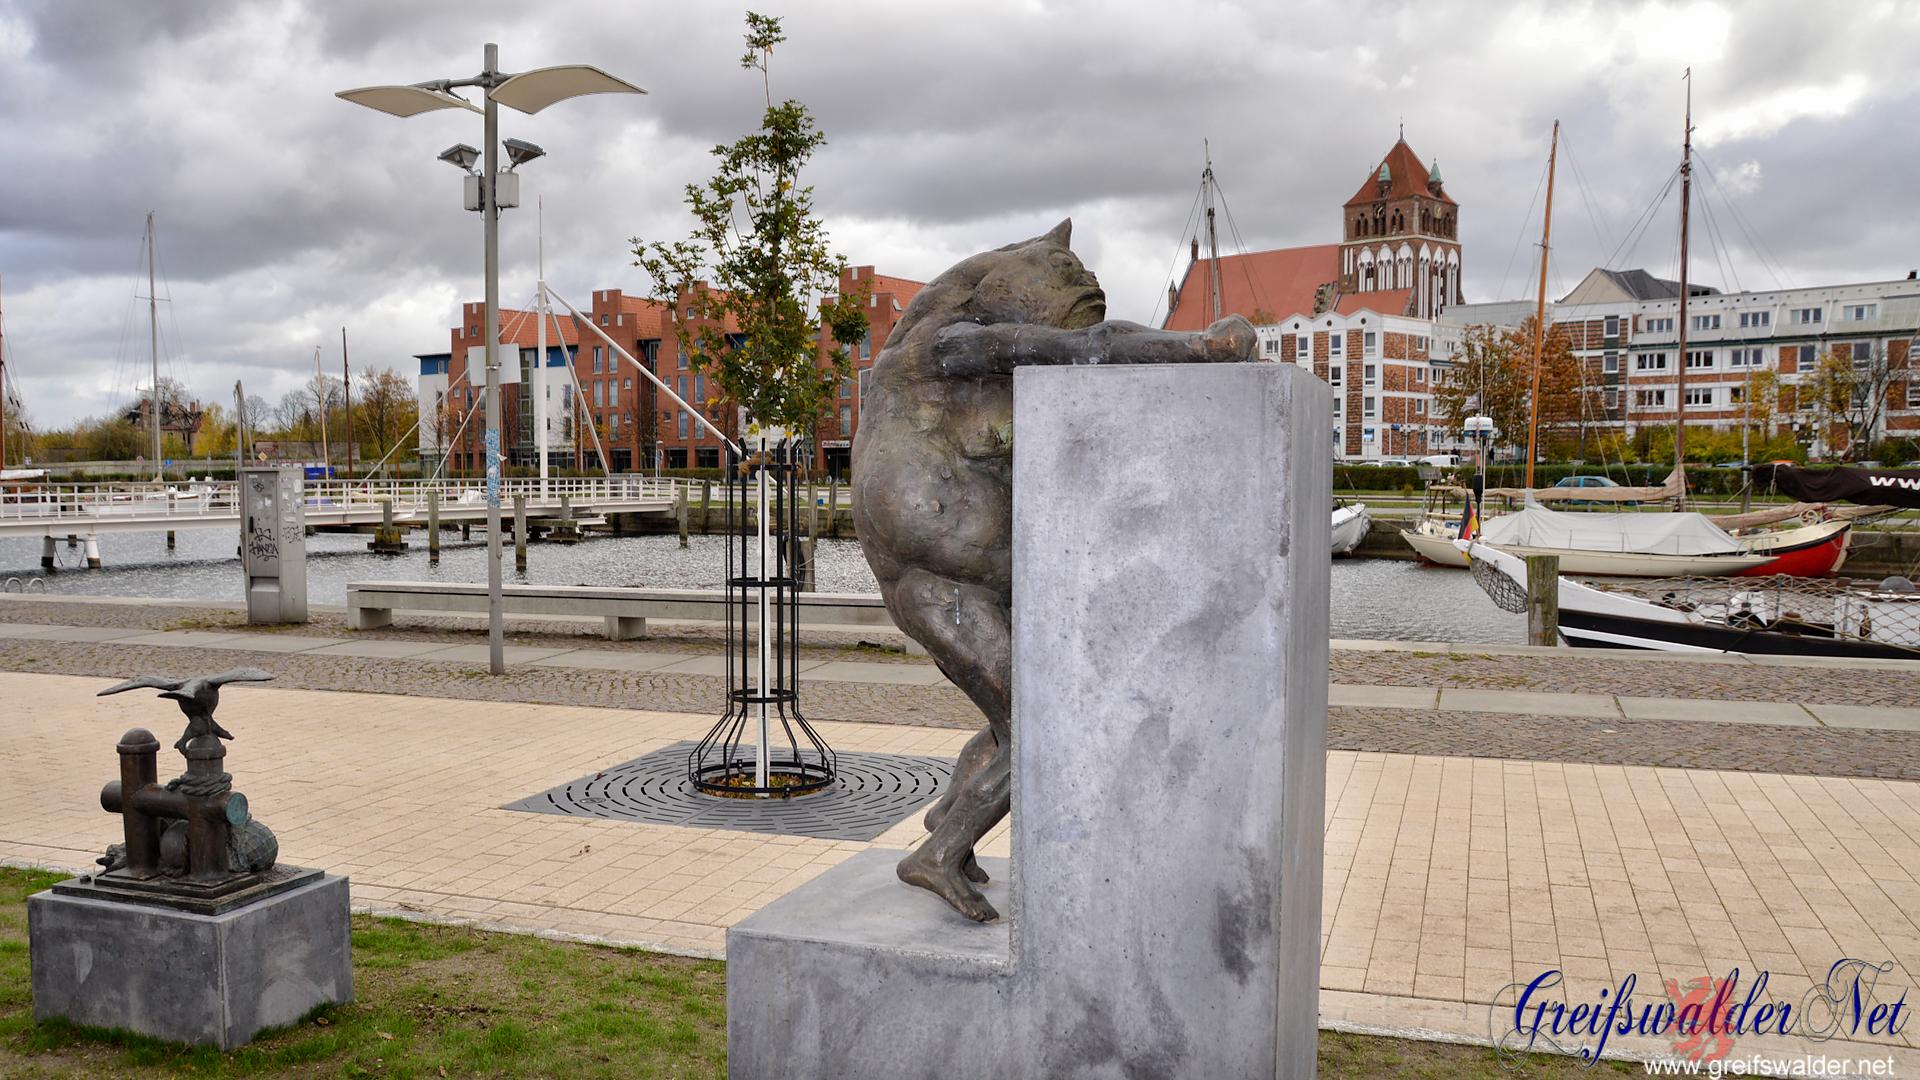 Klabautermann in Greifswald